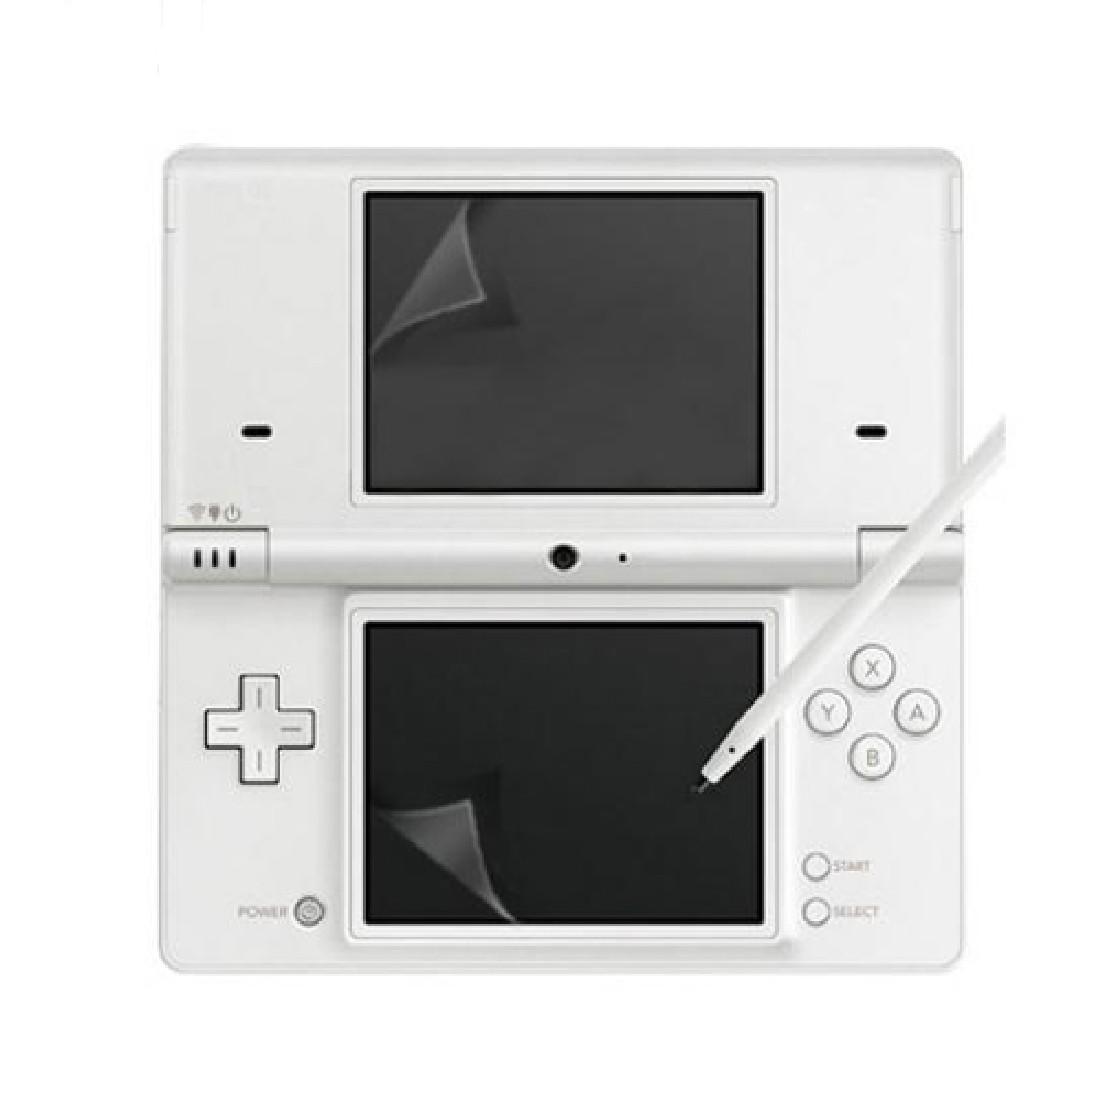 1 x ясно Защитные пленки для Nintendo Lite Ds Nds Ndsl replacement touch screen for nds nintendo ds